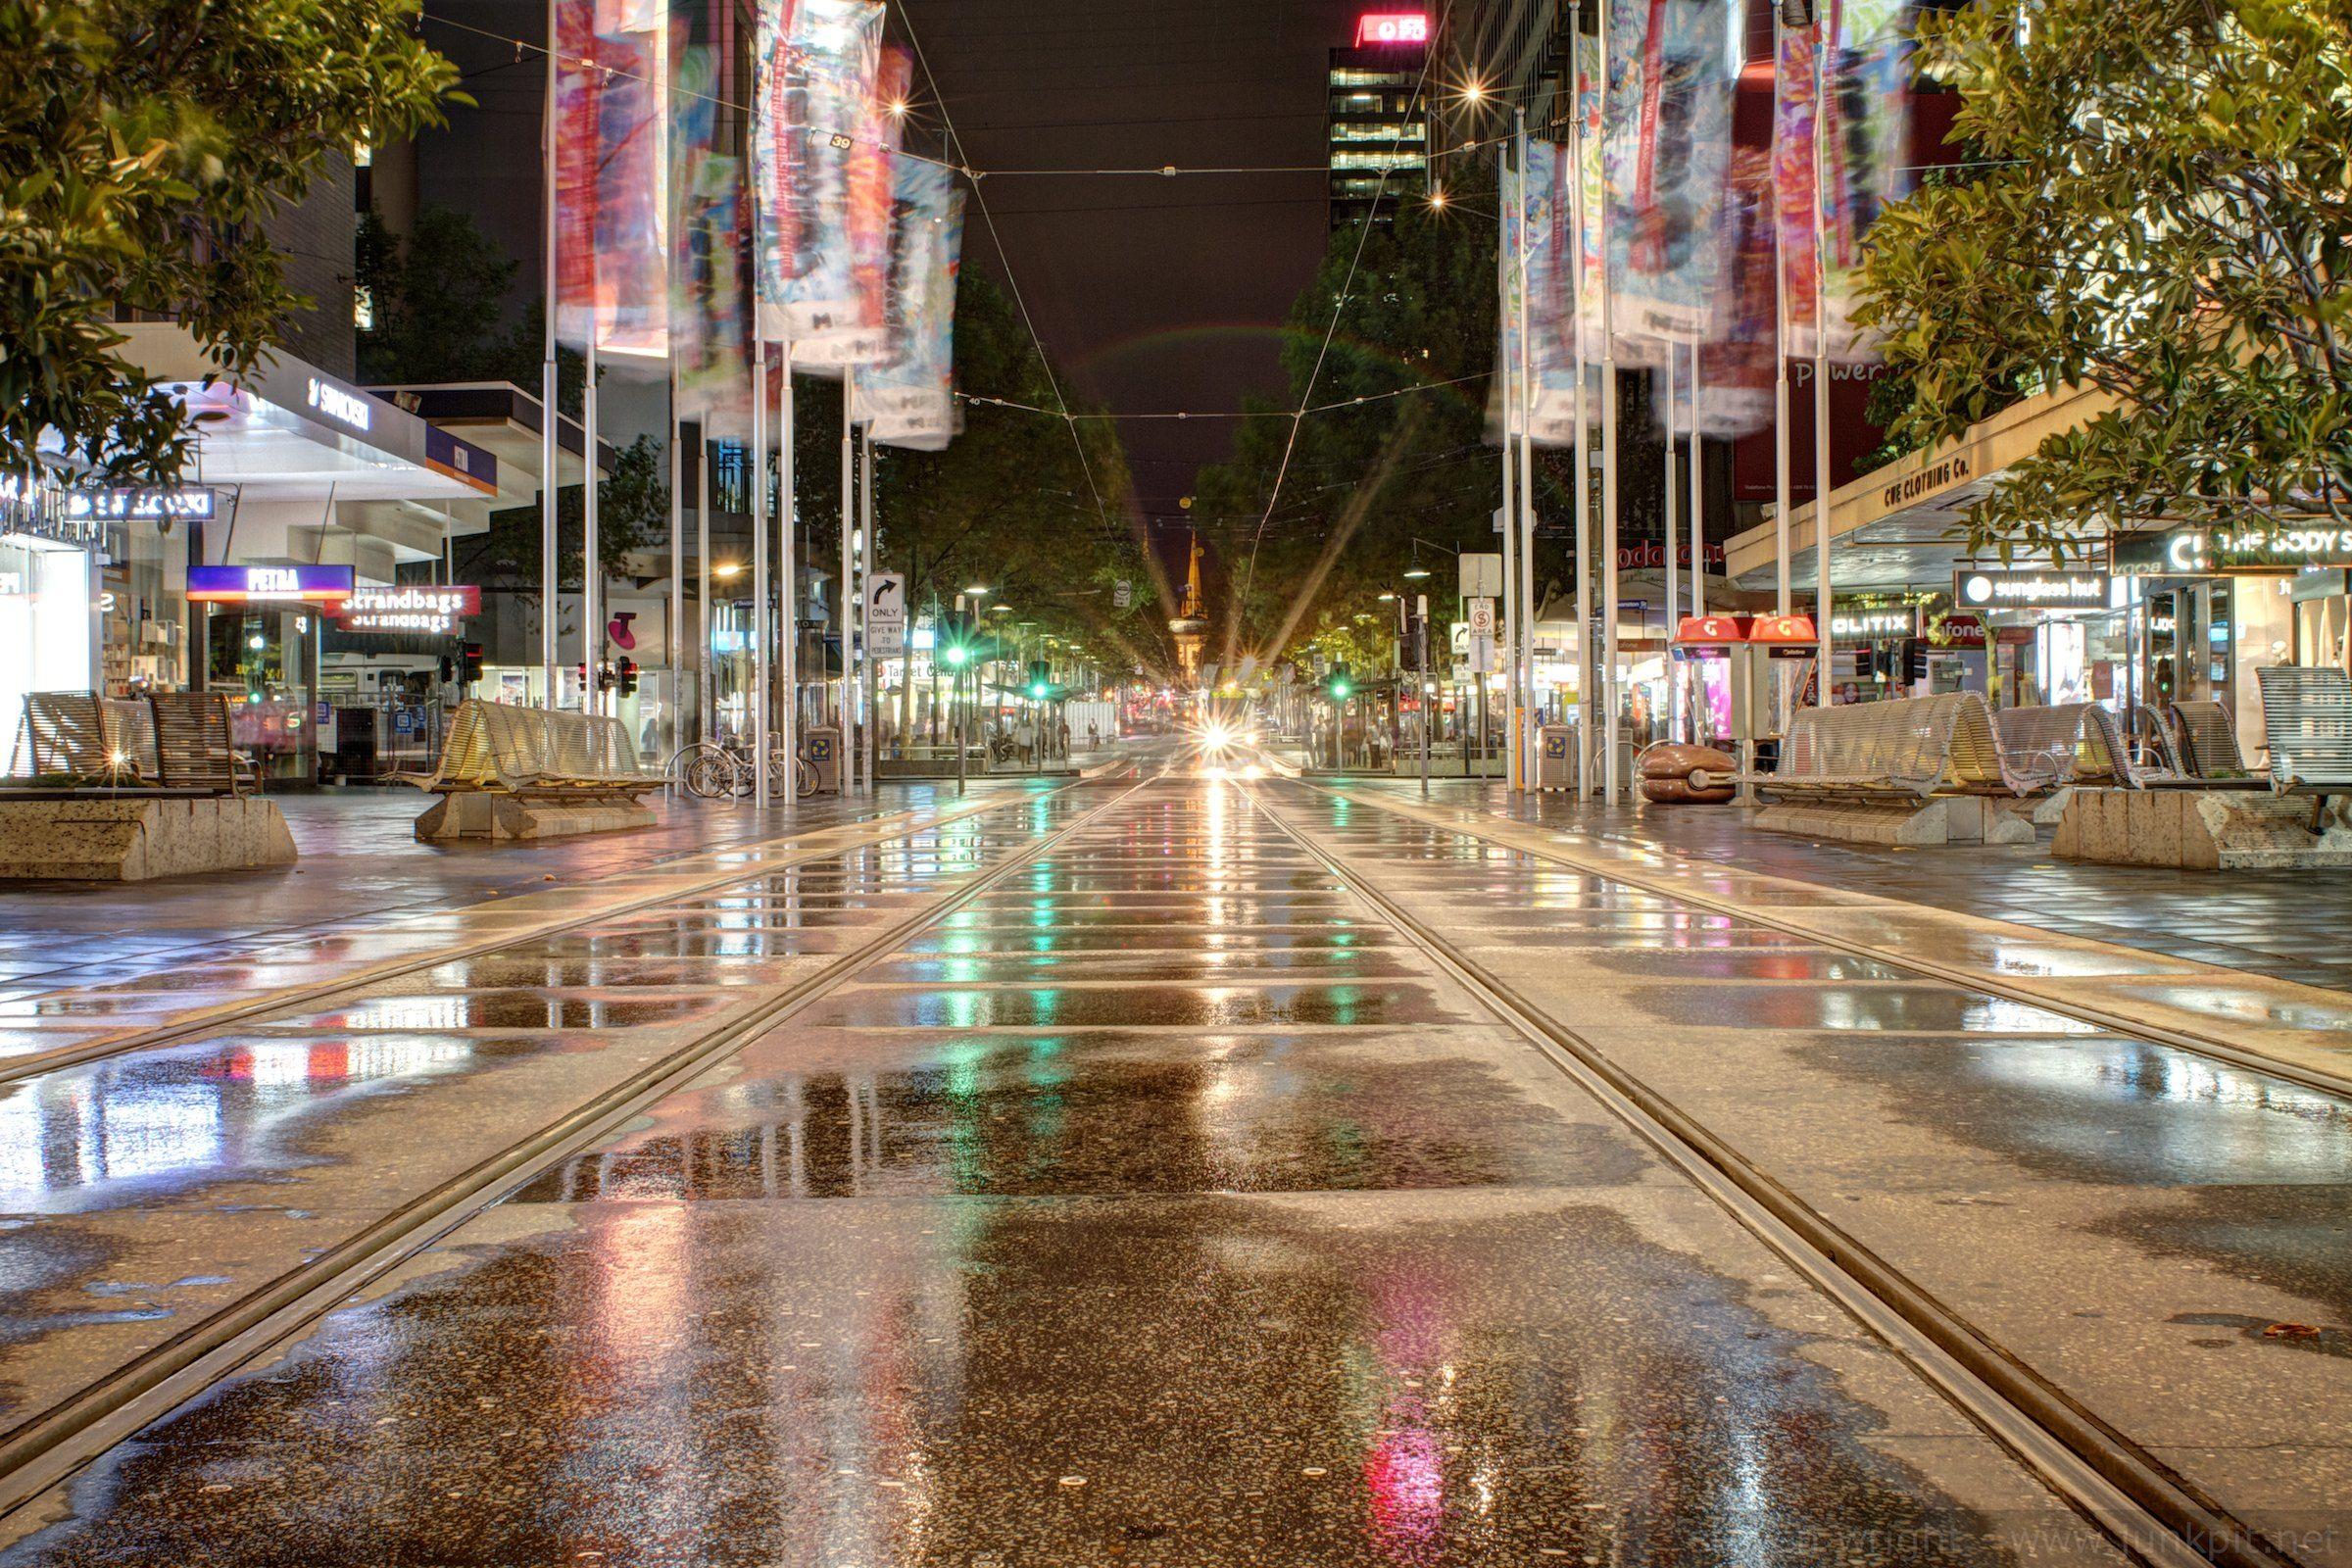 City Street Night Google Search City Streets Night City